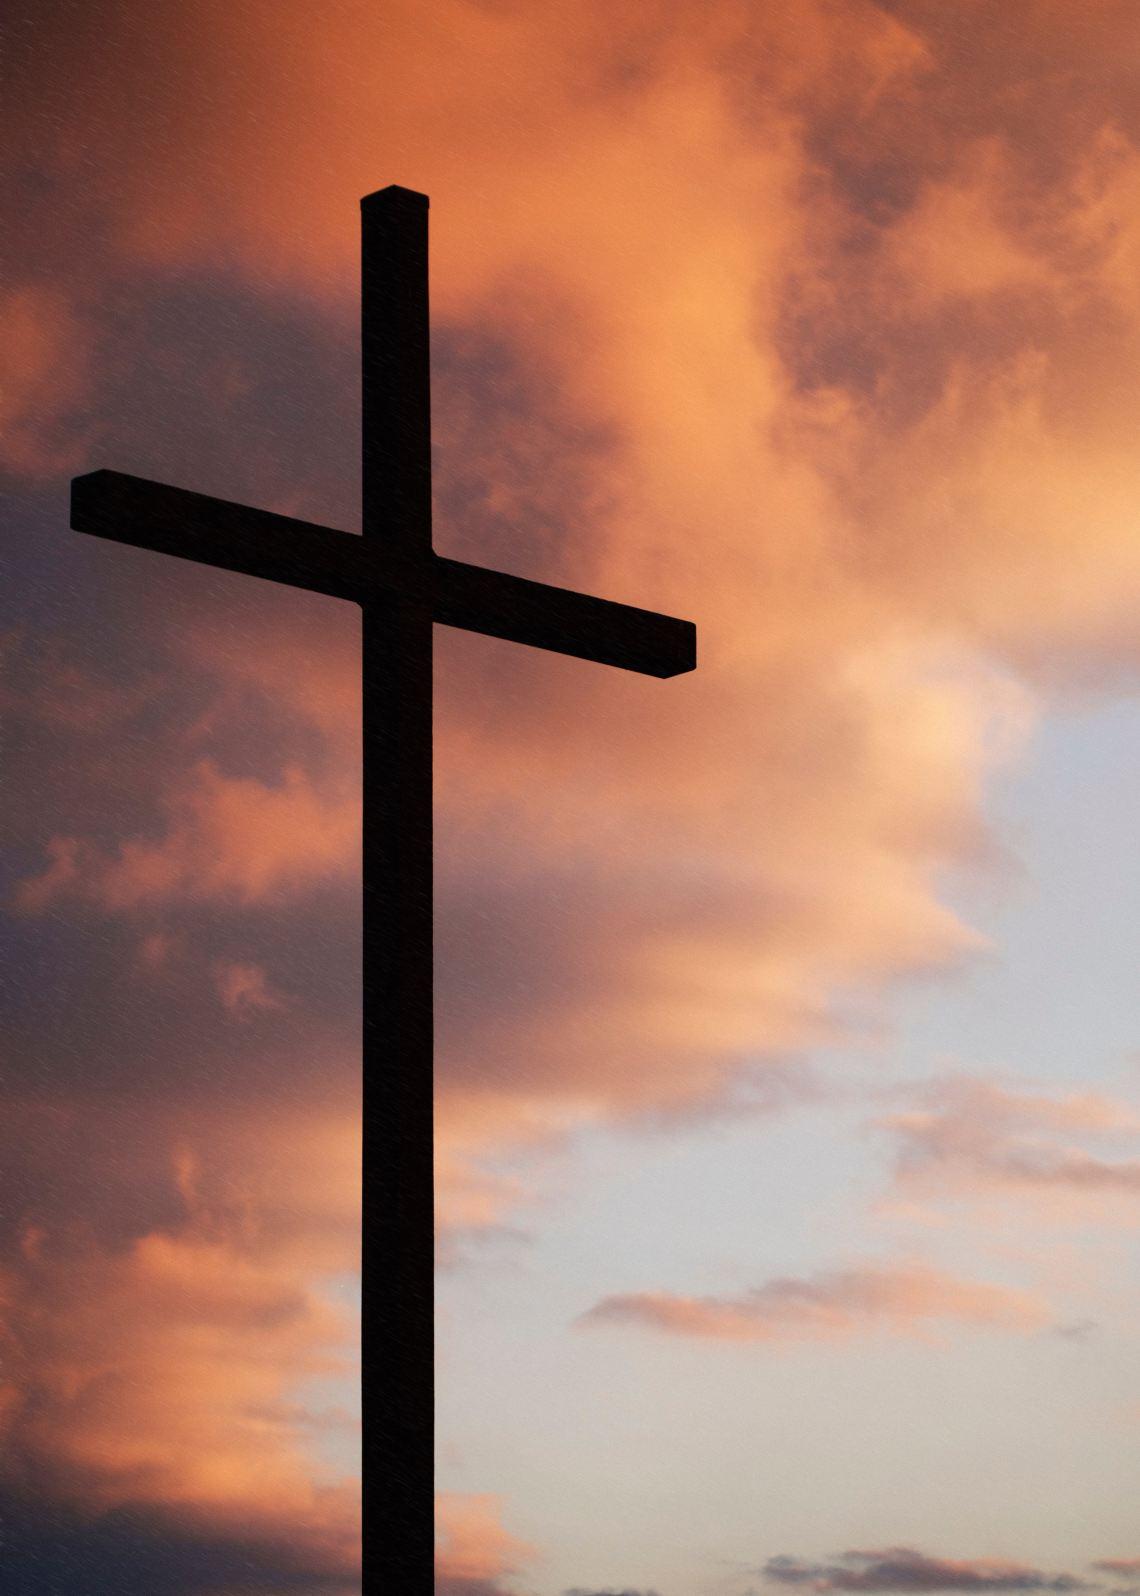 35 Bible verses on wellness – LoriKemi